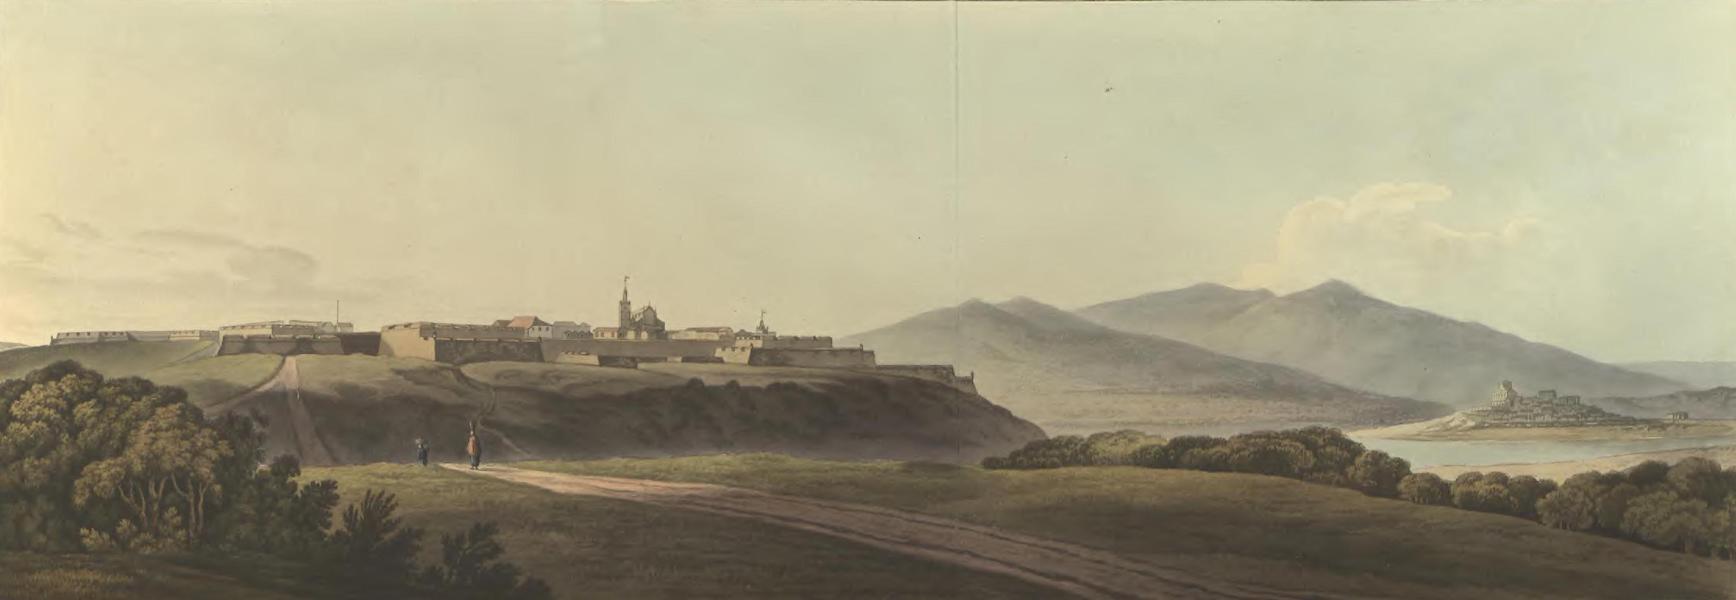 Historical, Military, and Picturesque Observations on Portugal Vol. 2 - Valenca do Minho: Entre Douro-e-Minho (1818)